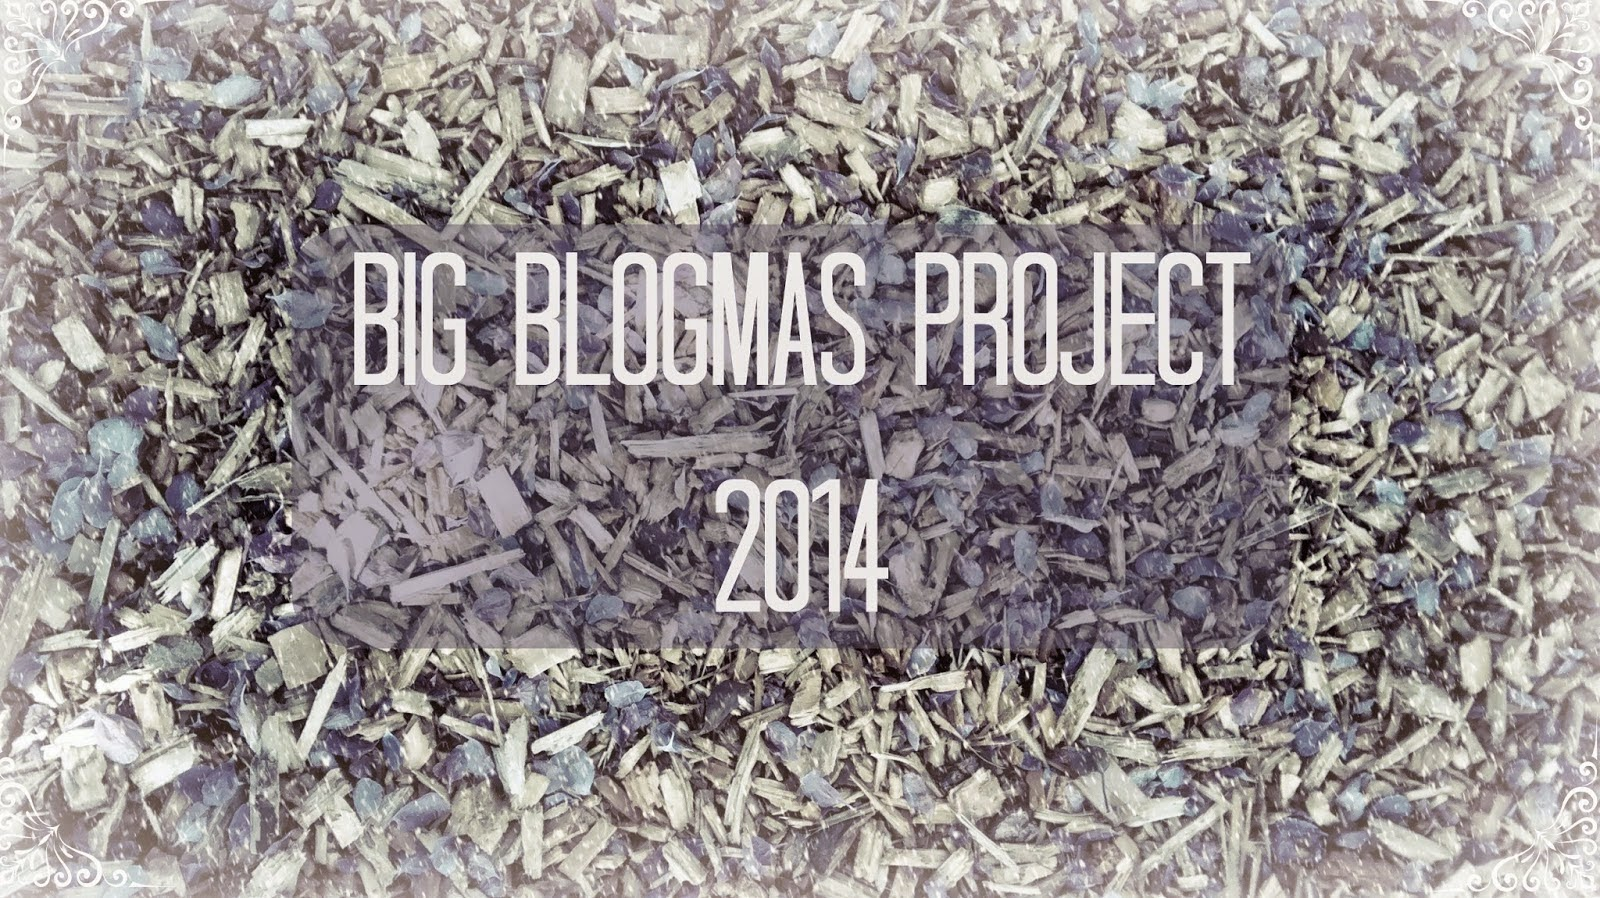 Big Blogmas Project